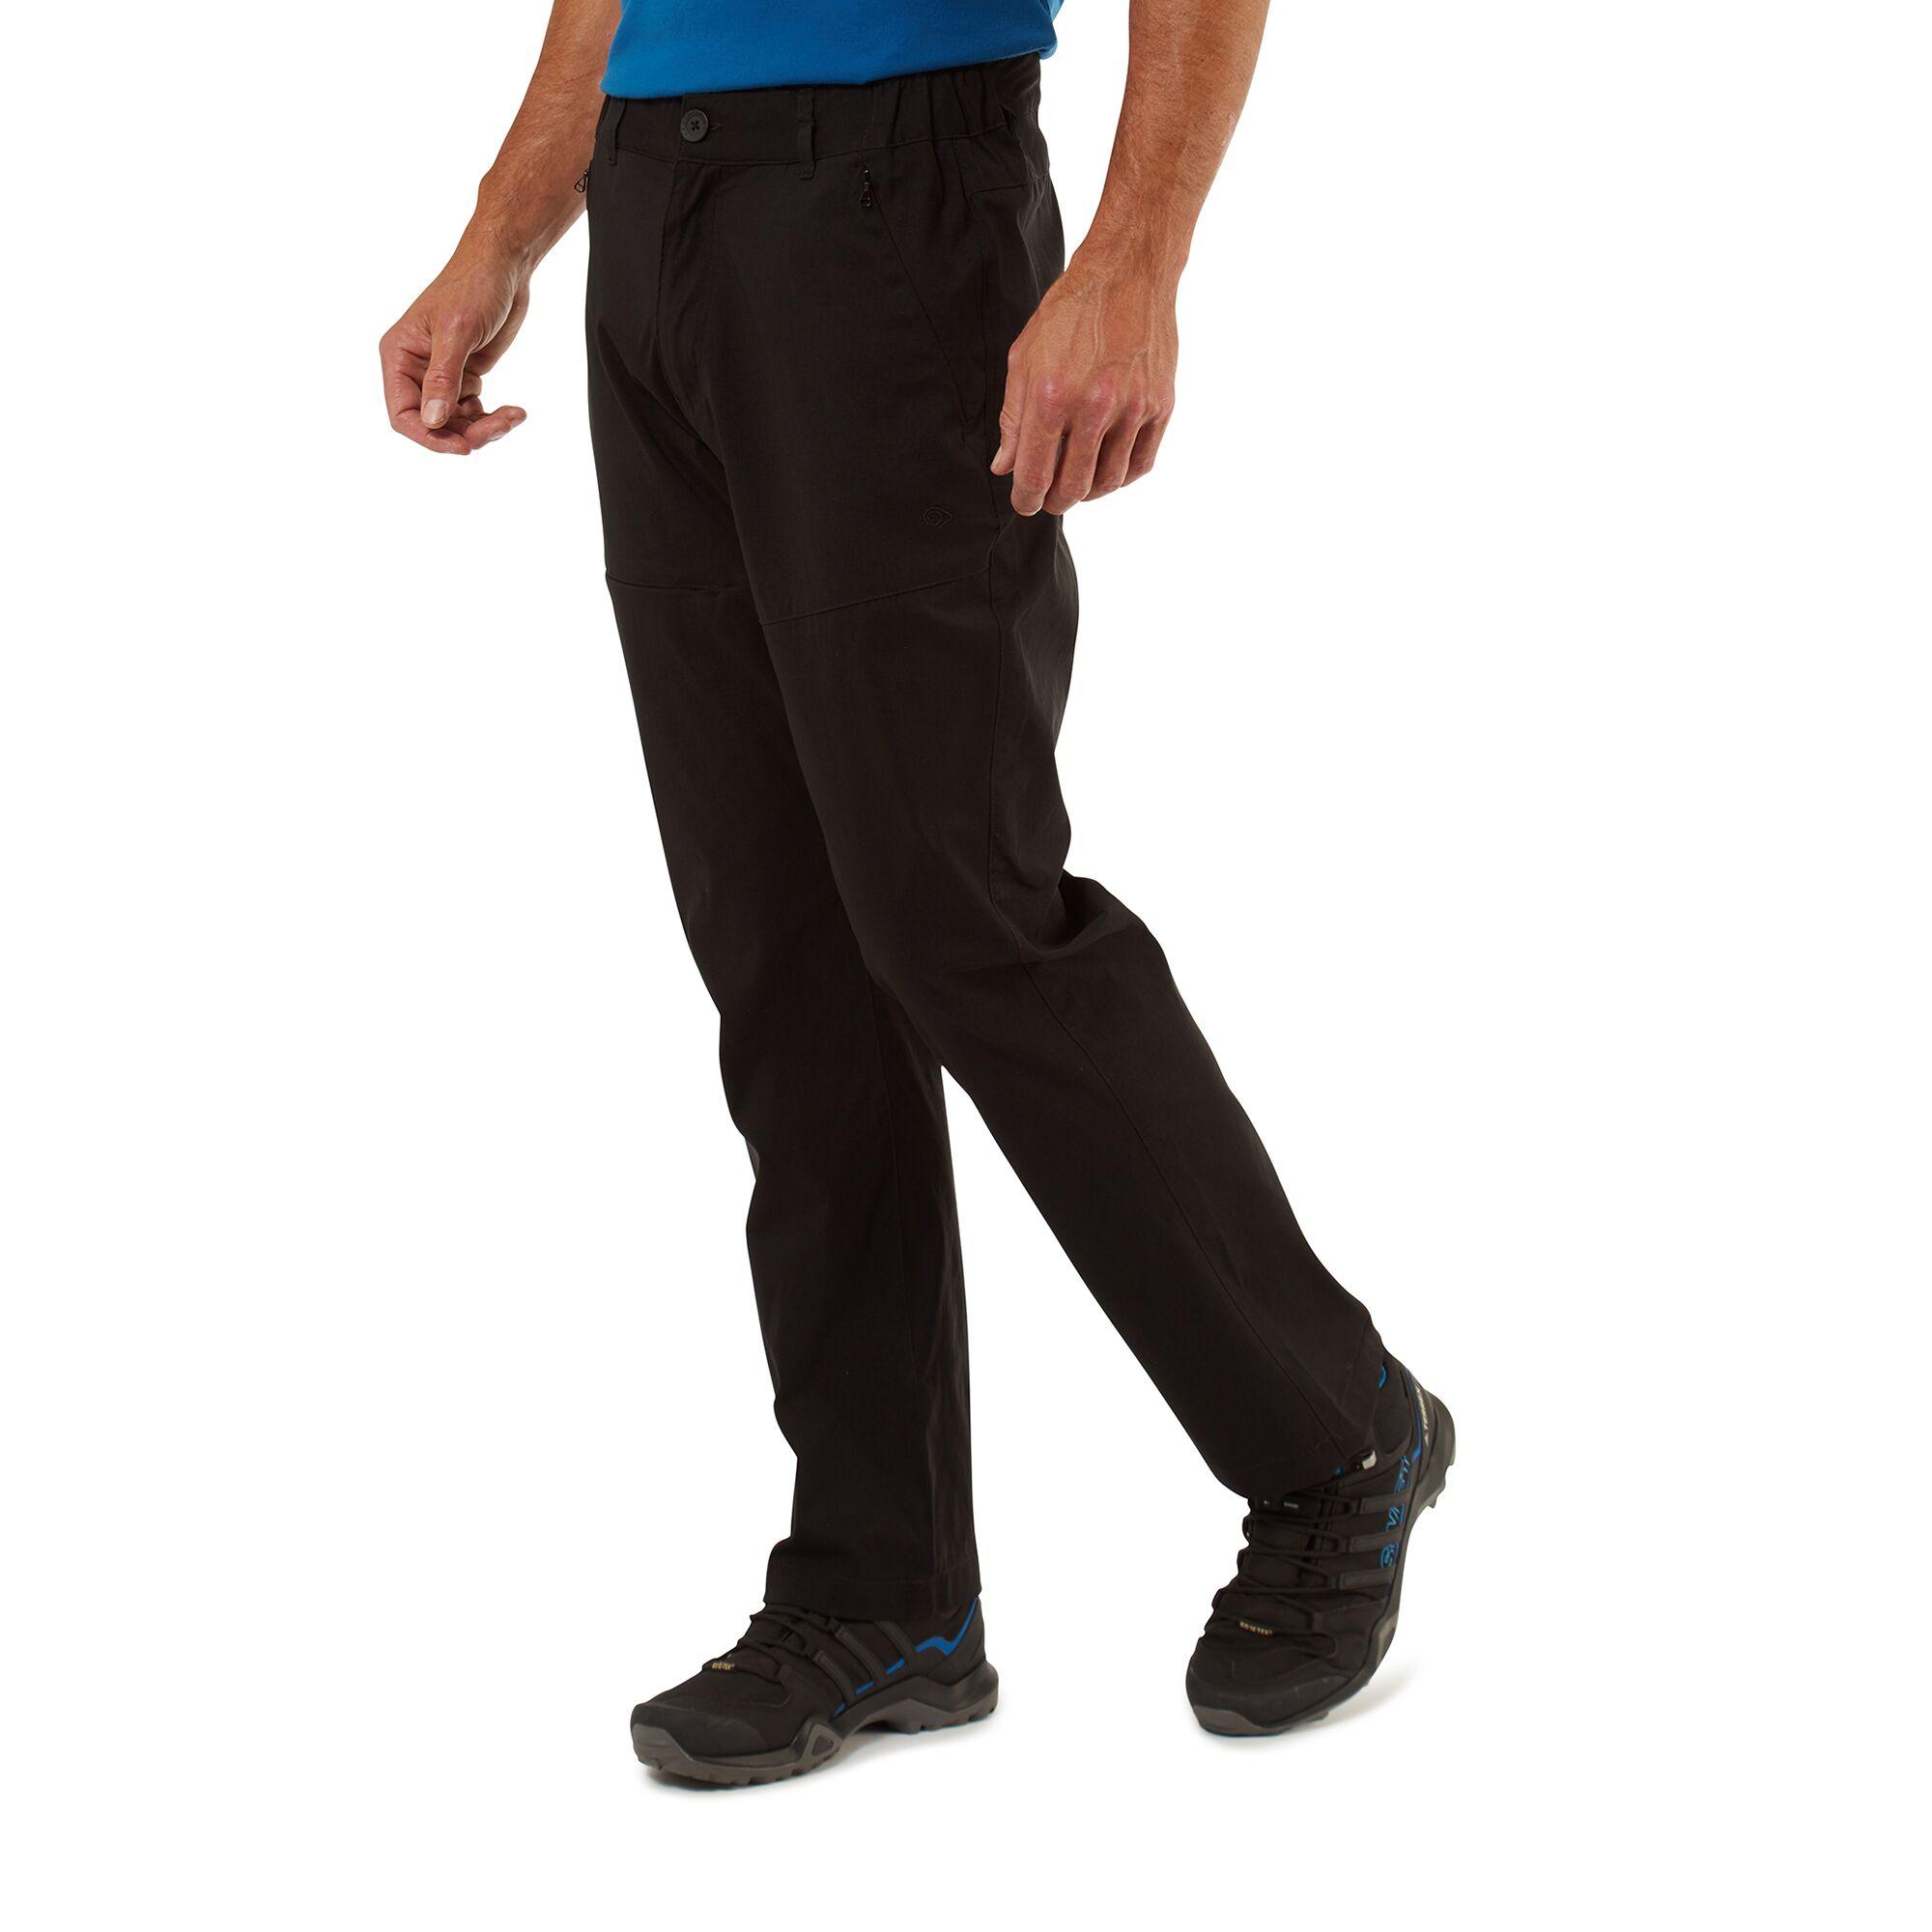 Craghoppers Mens Mindfully Made Kiwi Pro Ii Trousers-black-40-l